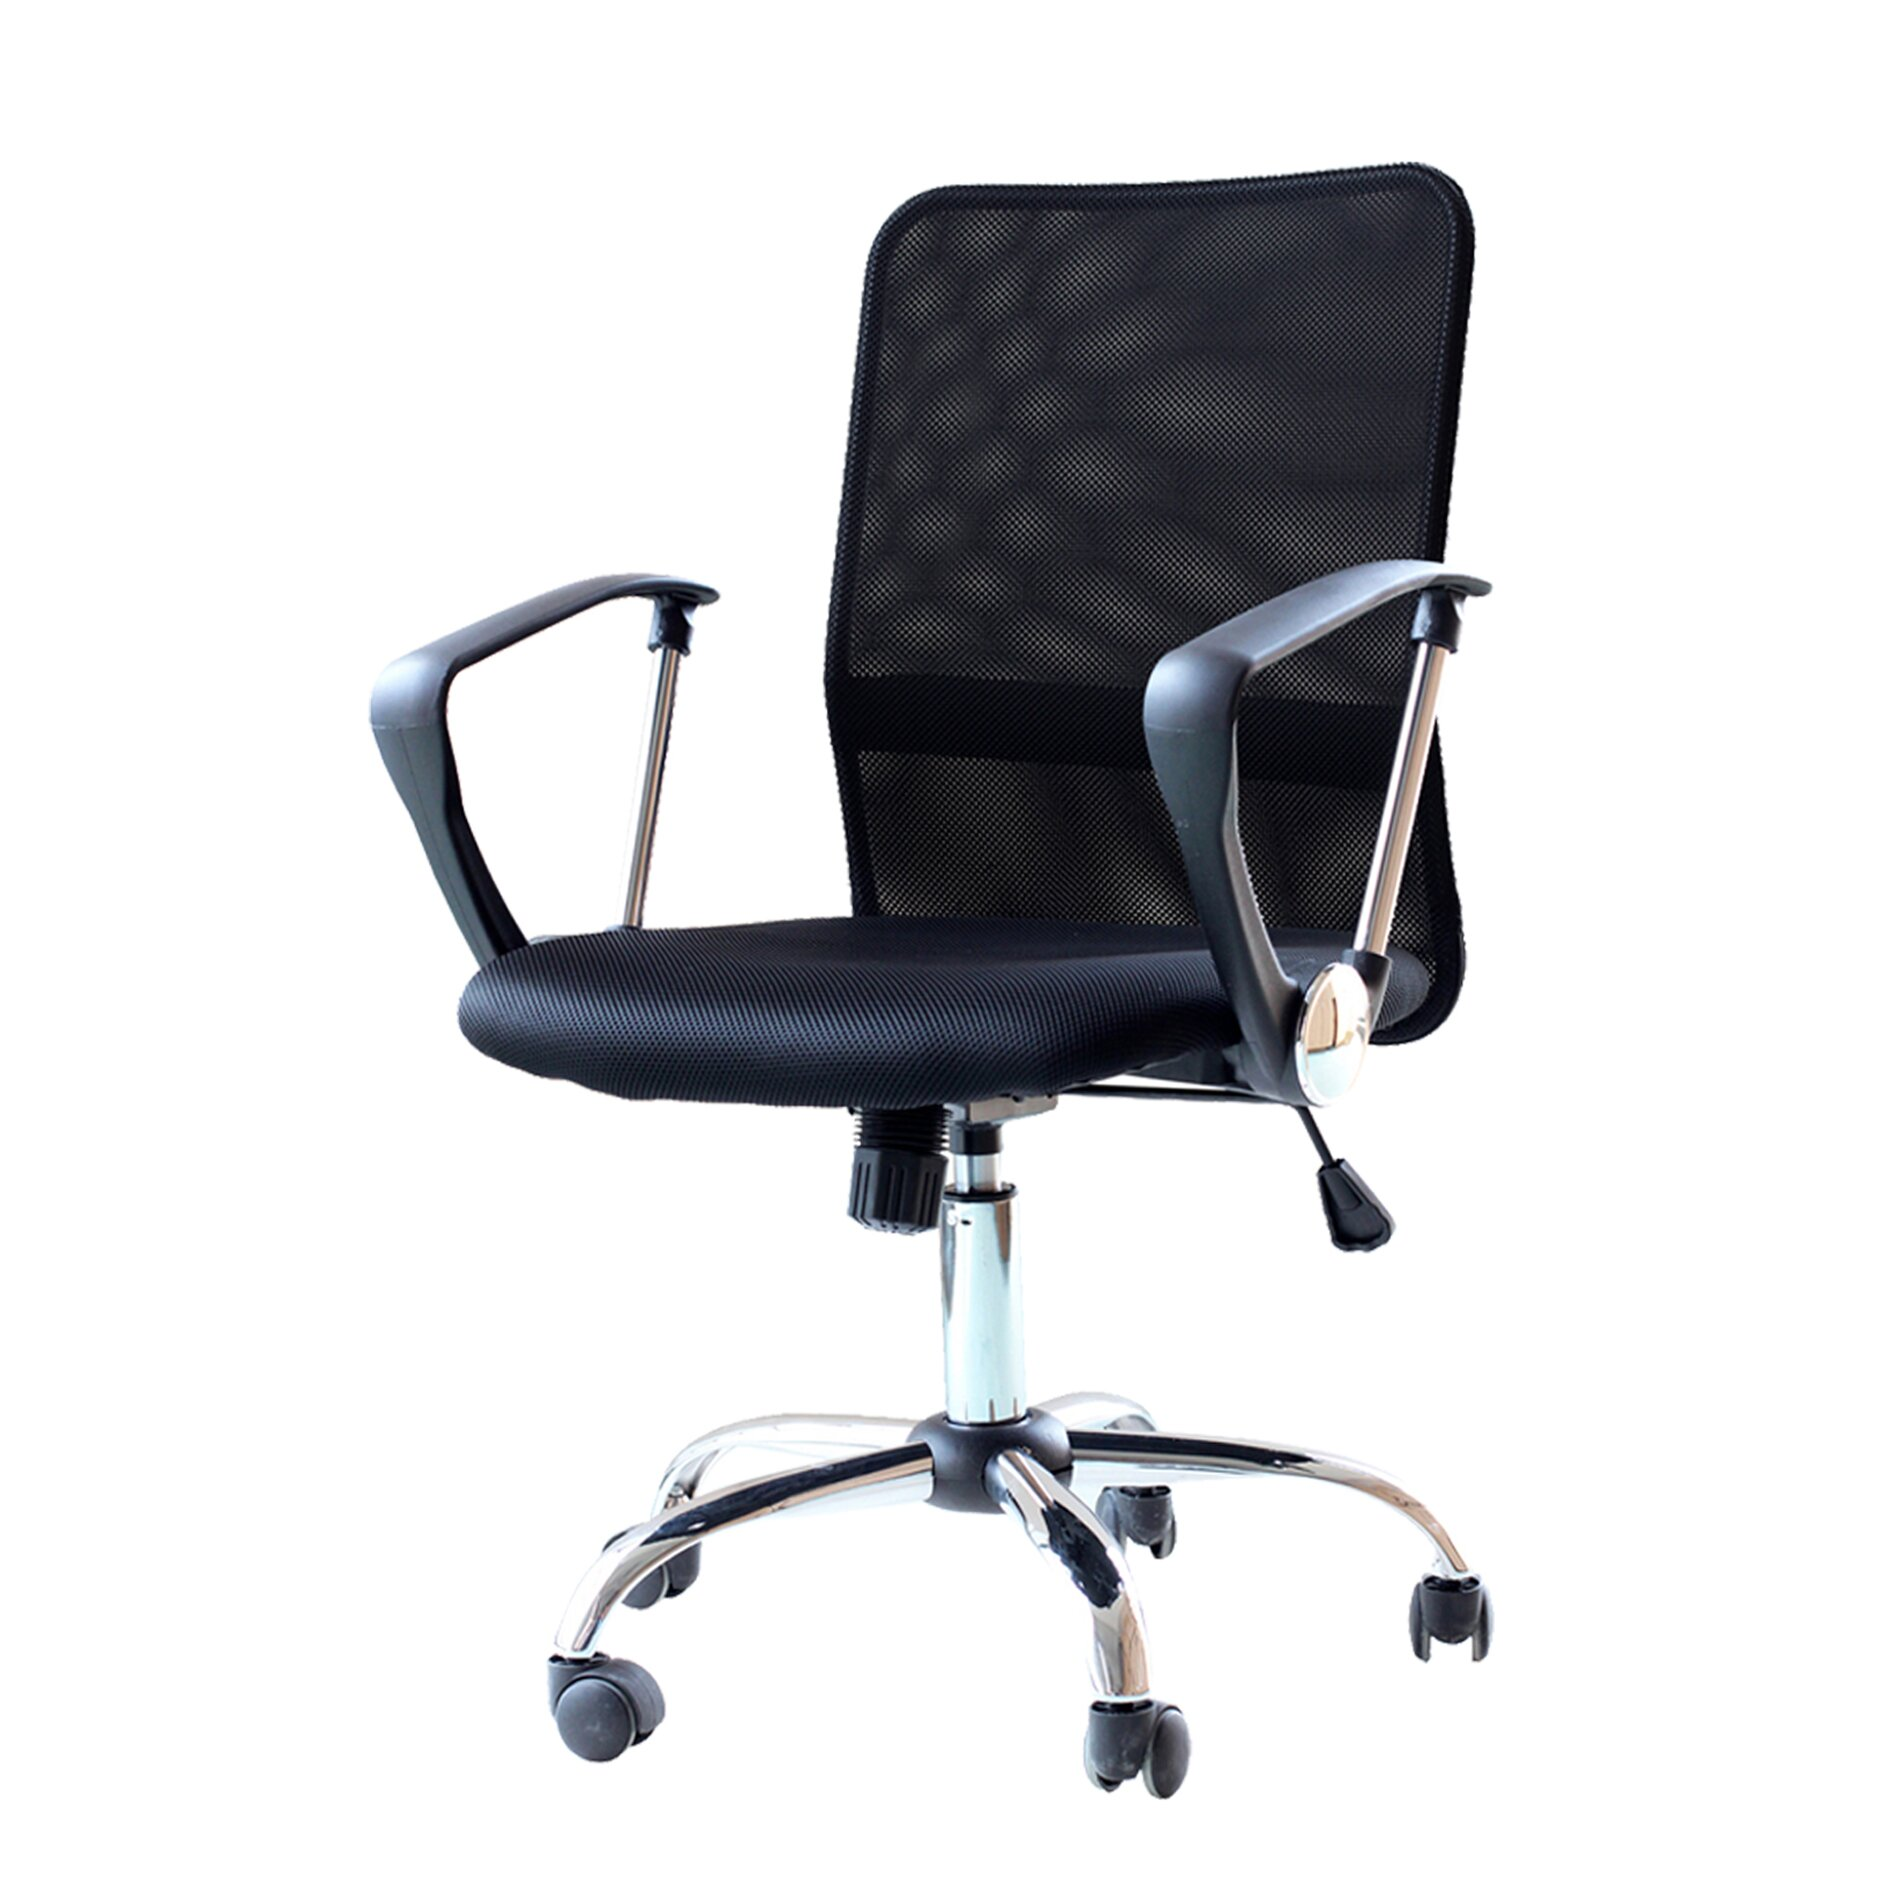 IDSOnlineCorp Ergonomic Adjustable Mid Back Mesh Desk